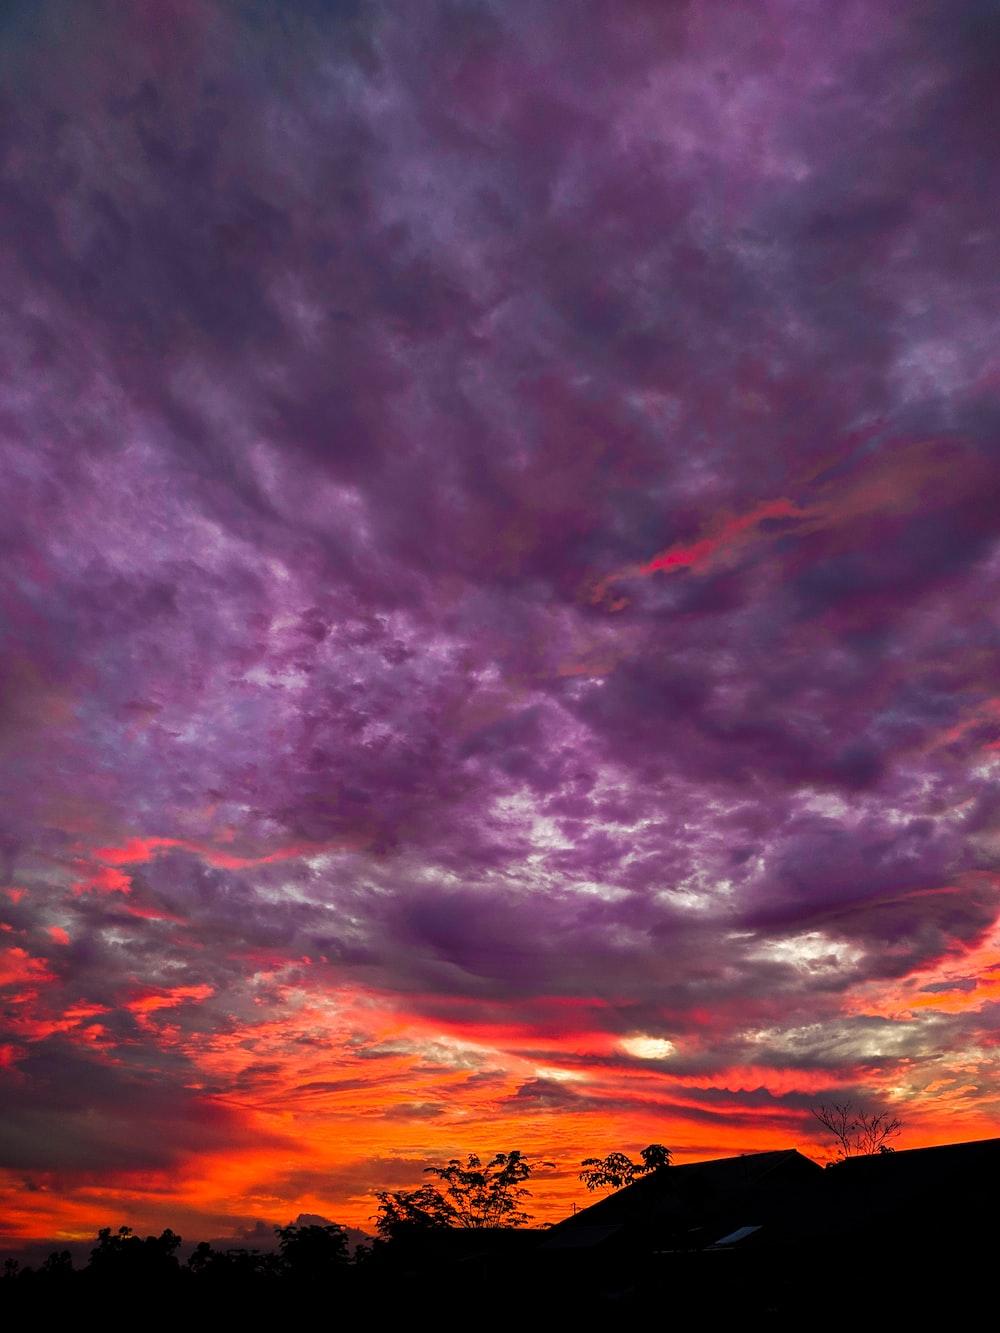 silhouette of mountain under purple and orange skies